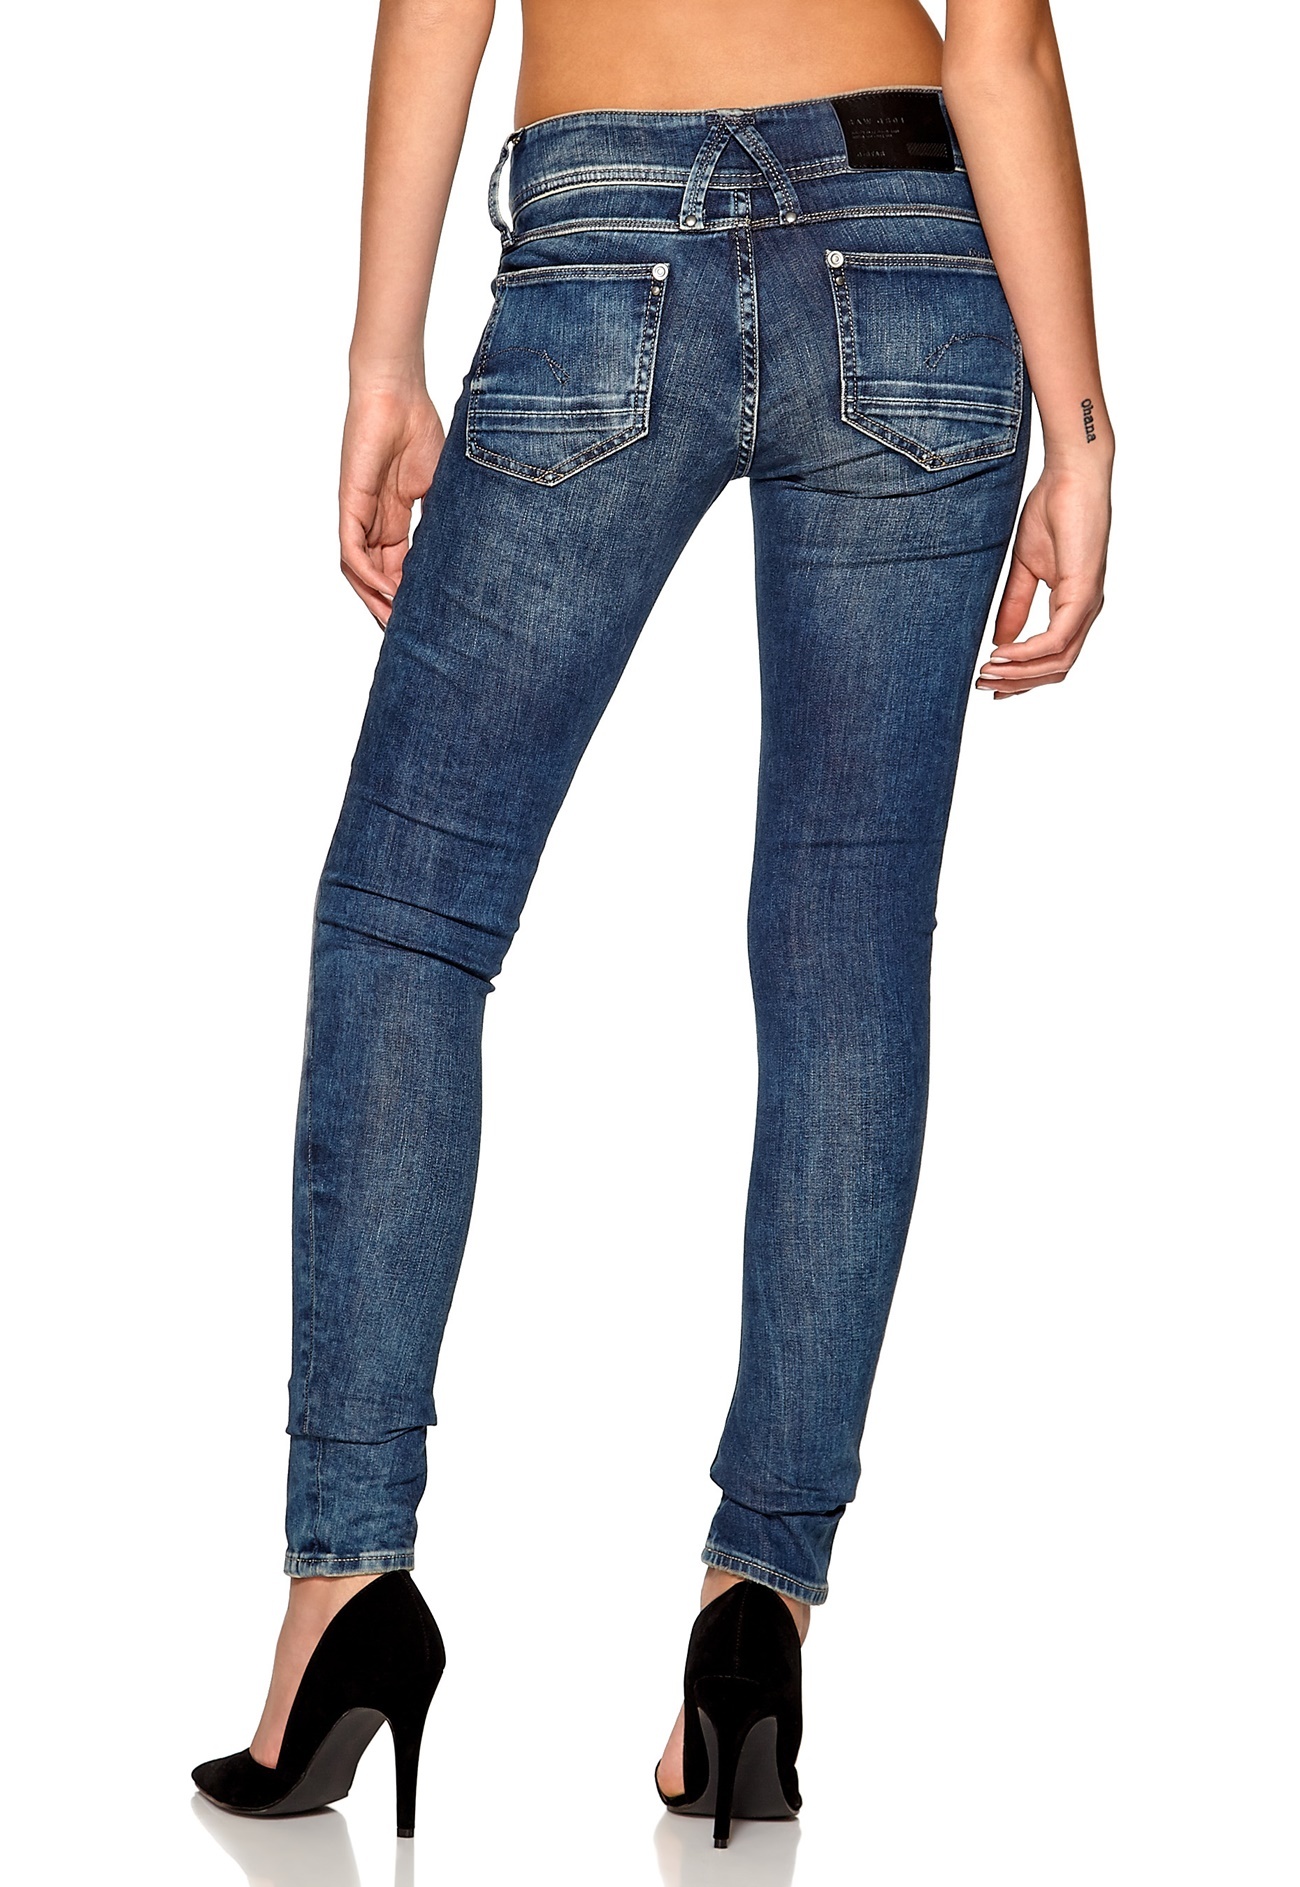 g star lynn skinny jeans 071 medium aged bubbleroom. Black Bedroom Furniture Sets. Home Design Ideas